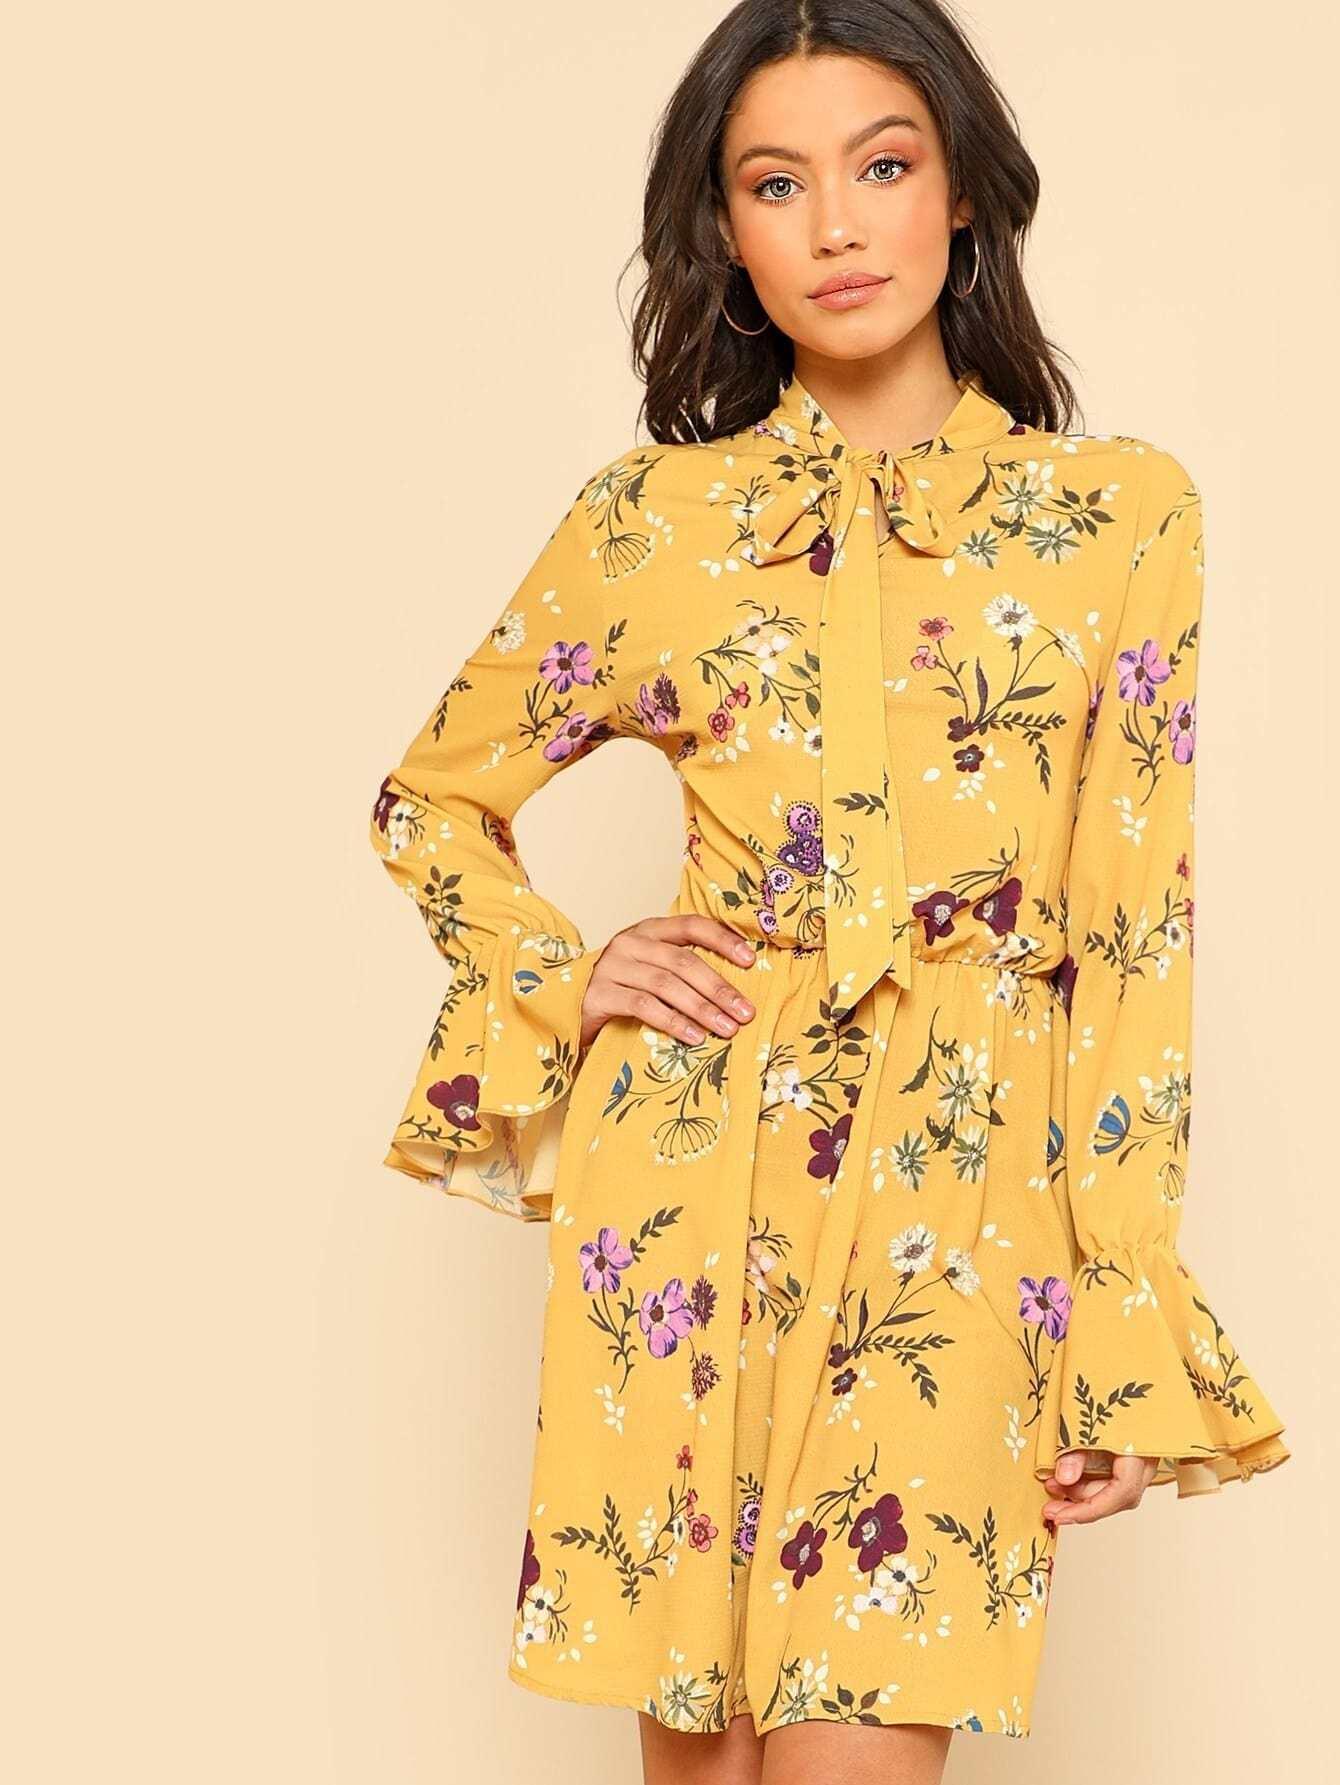 Tie Neck Elastic Waist Floral Dress tie neck elastic waist glitter dress